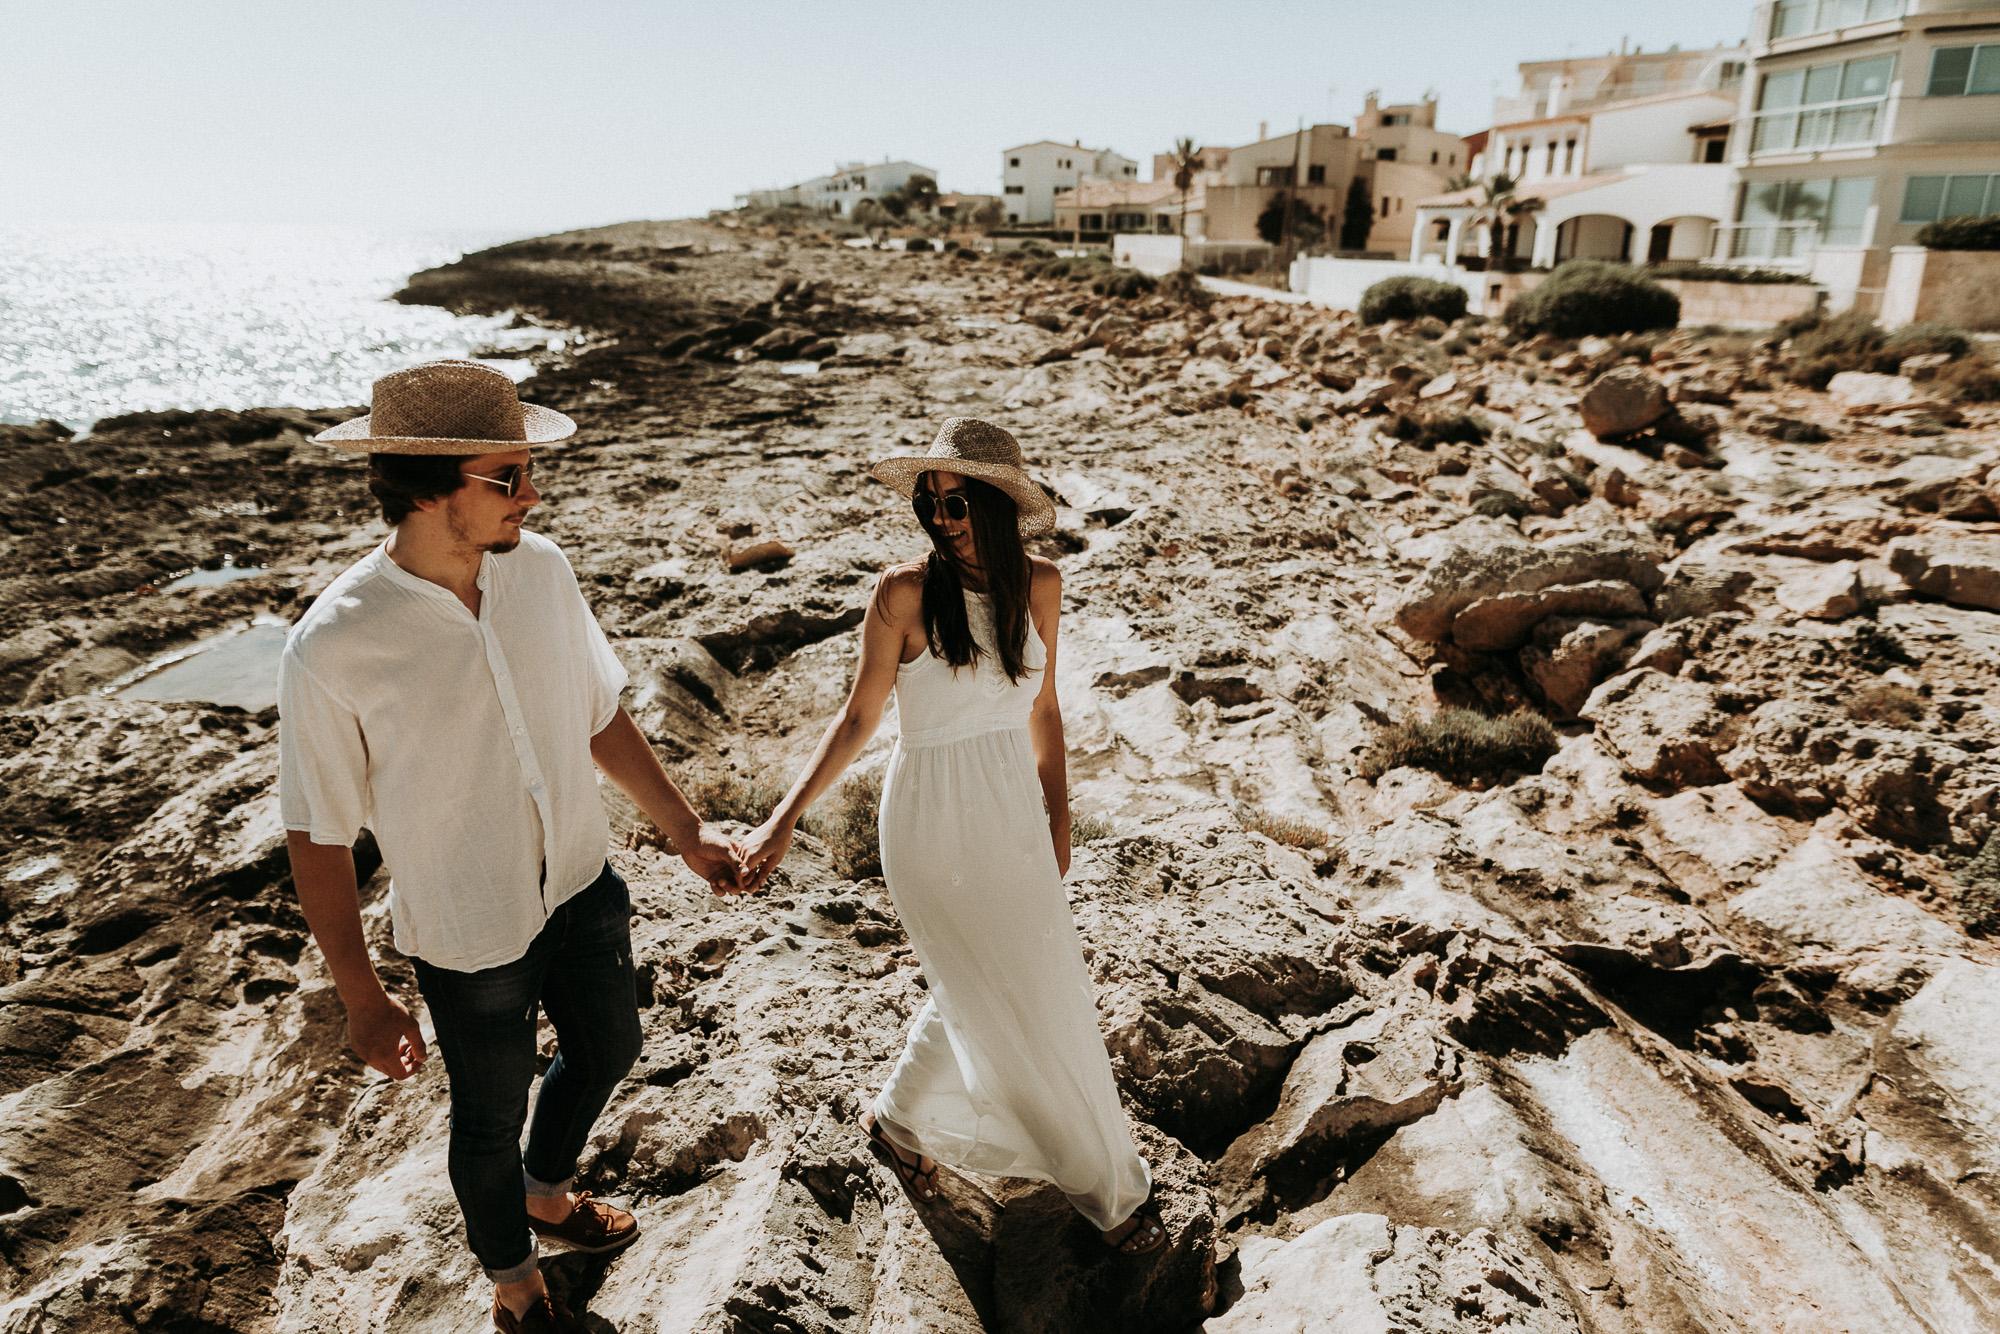 DanielaMarquardtPhotography_wedding_elopement_mallorca_spain_stjordi_sessalines_marinaandxavi358